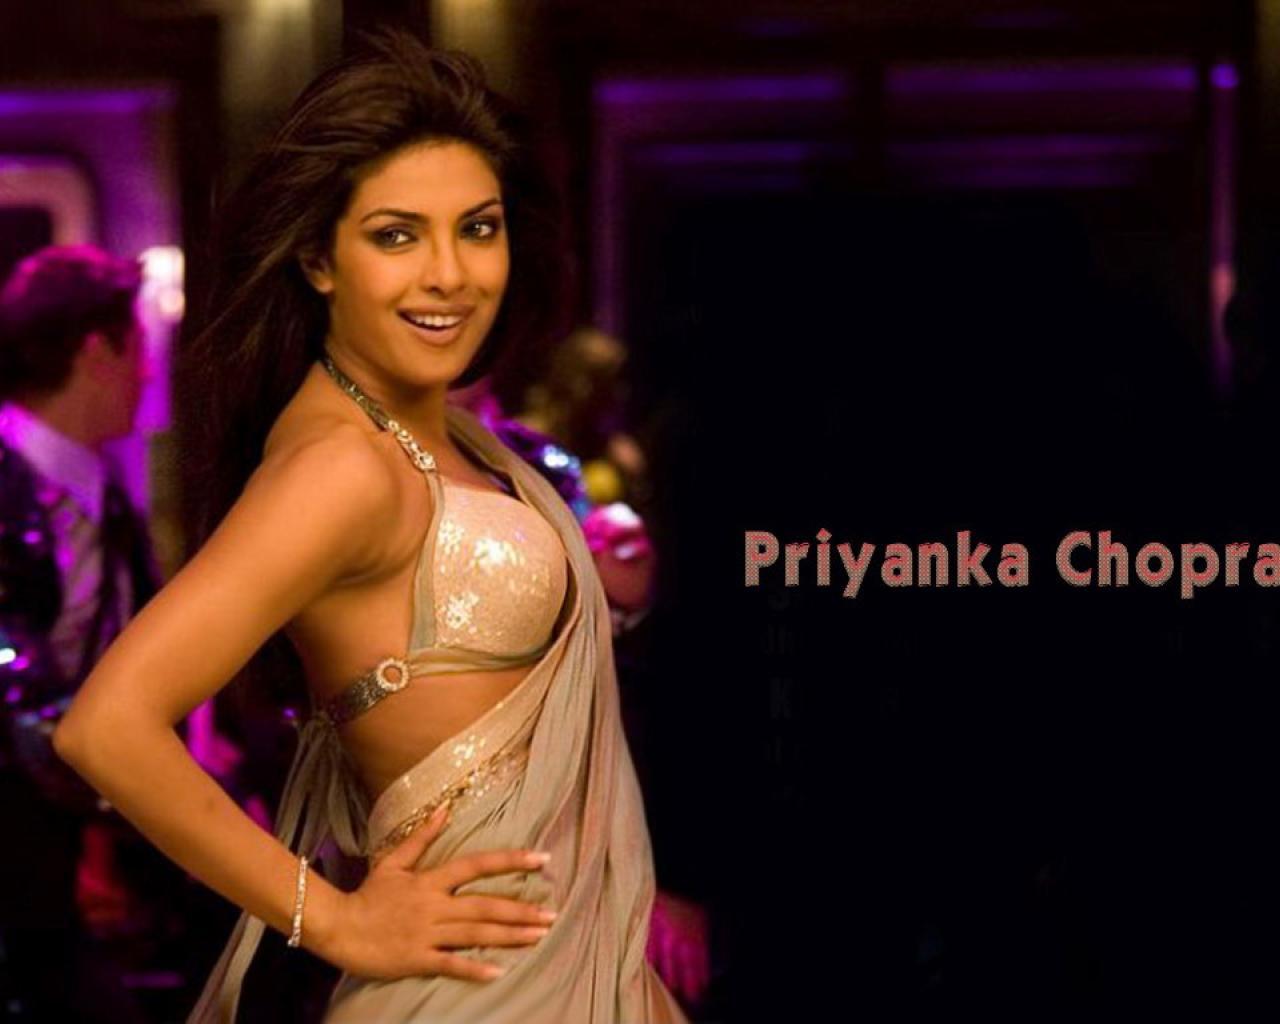 http://4.bp.blogspot.com/_y-SPVyDlvrk/TNSP4Dj5uWI/AAAAAAAAASg/regmsRl99cA/s1600/priyanka-chopra-in-new-film-dostana-wallpaperhh.jpg